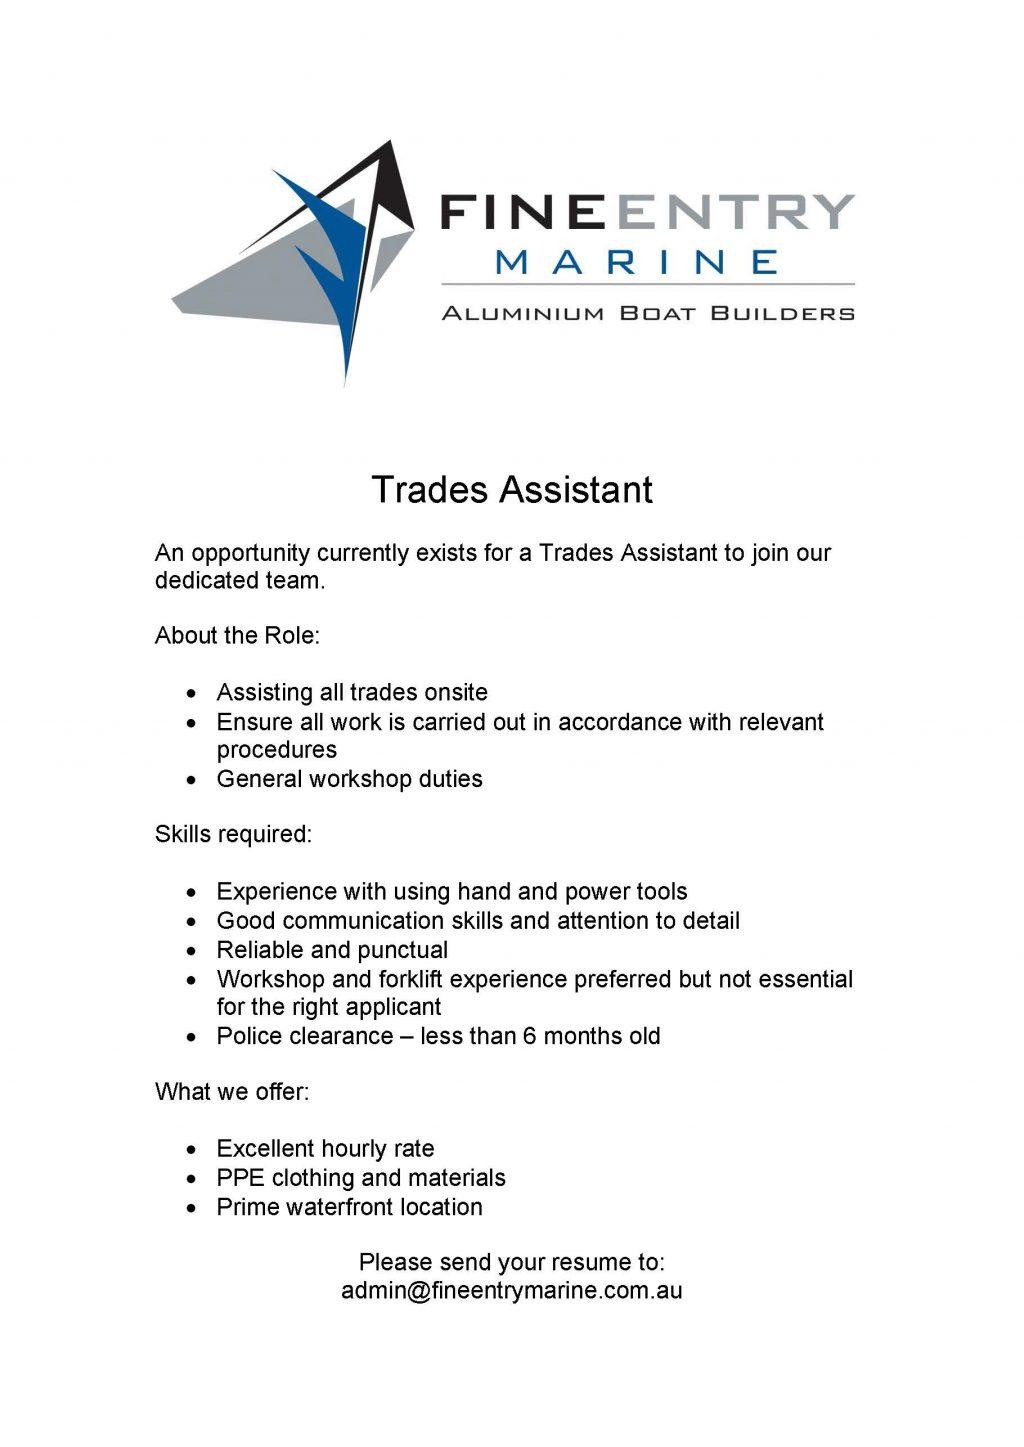 Trades Assistant vacancy